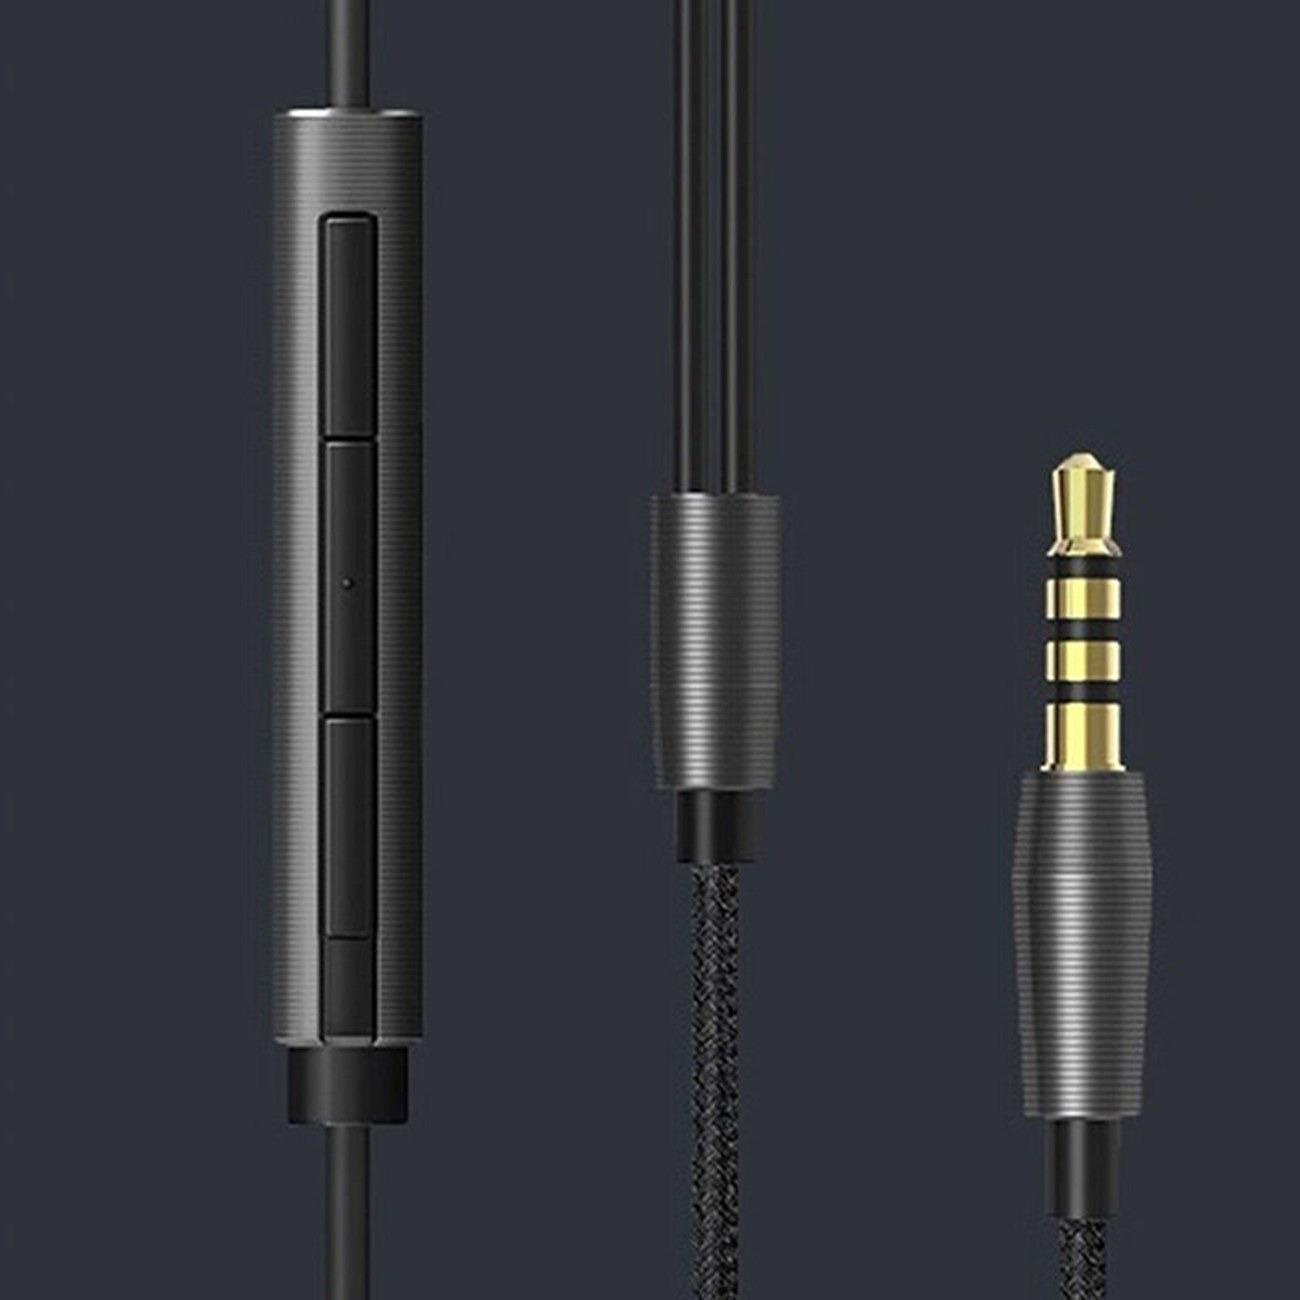 Kehebatan Xiaomi Premium Headset Headphones Hansfree Ear Bass Phones Piston 3 Colorful Edition Earphone Original Hitam 3rd Black 5